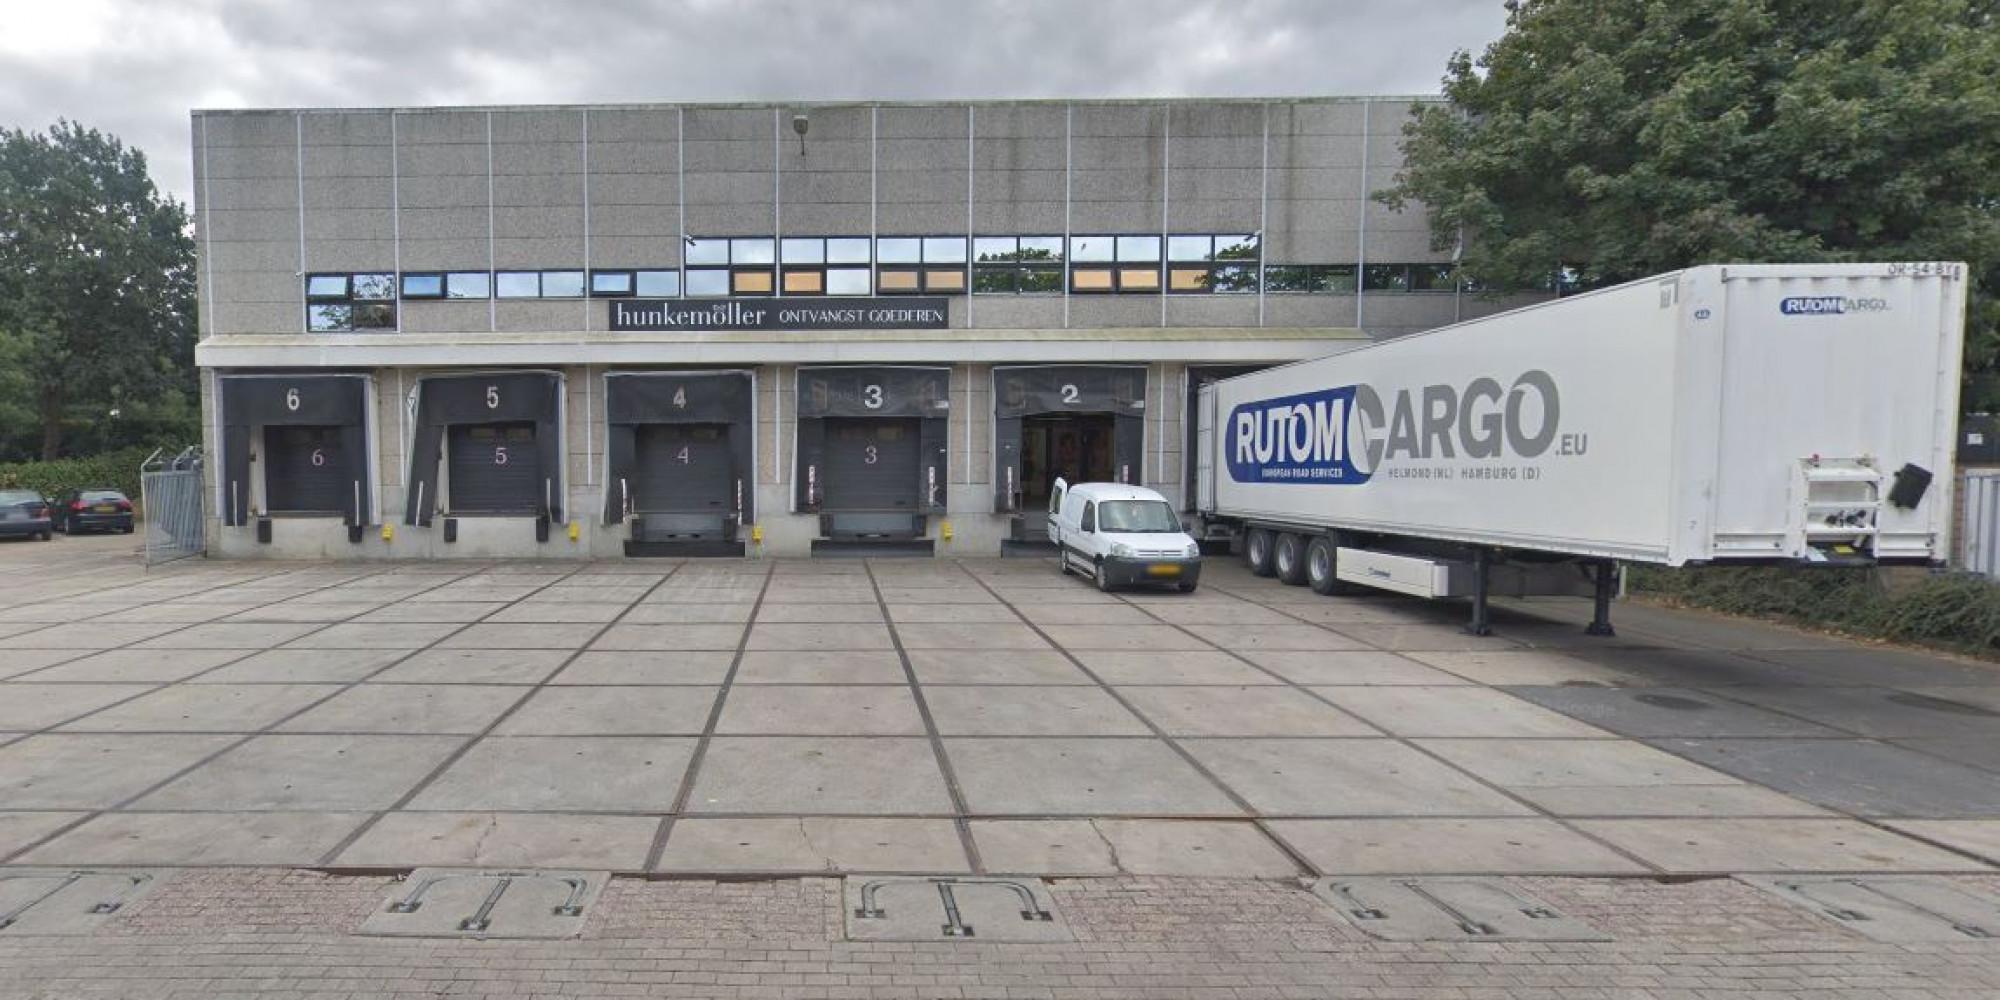 Distributiecentrum Hunkemoller Hilversum